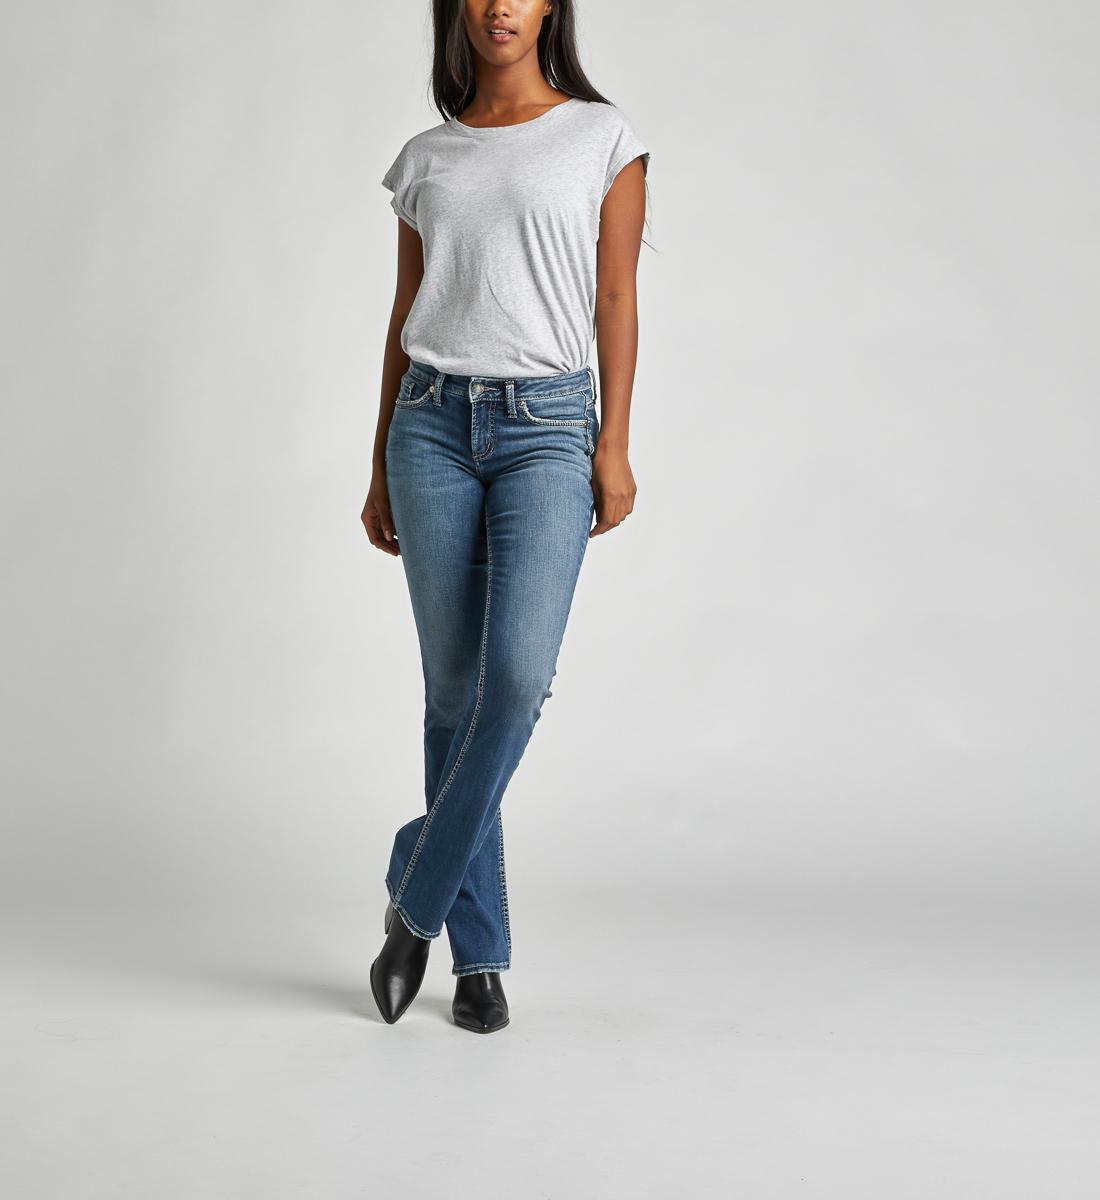 Silver Jeans Suki Mid-Rise Curvy Slim Bootcut Jeans